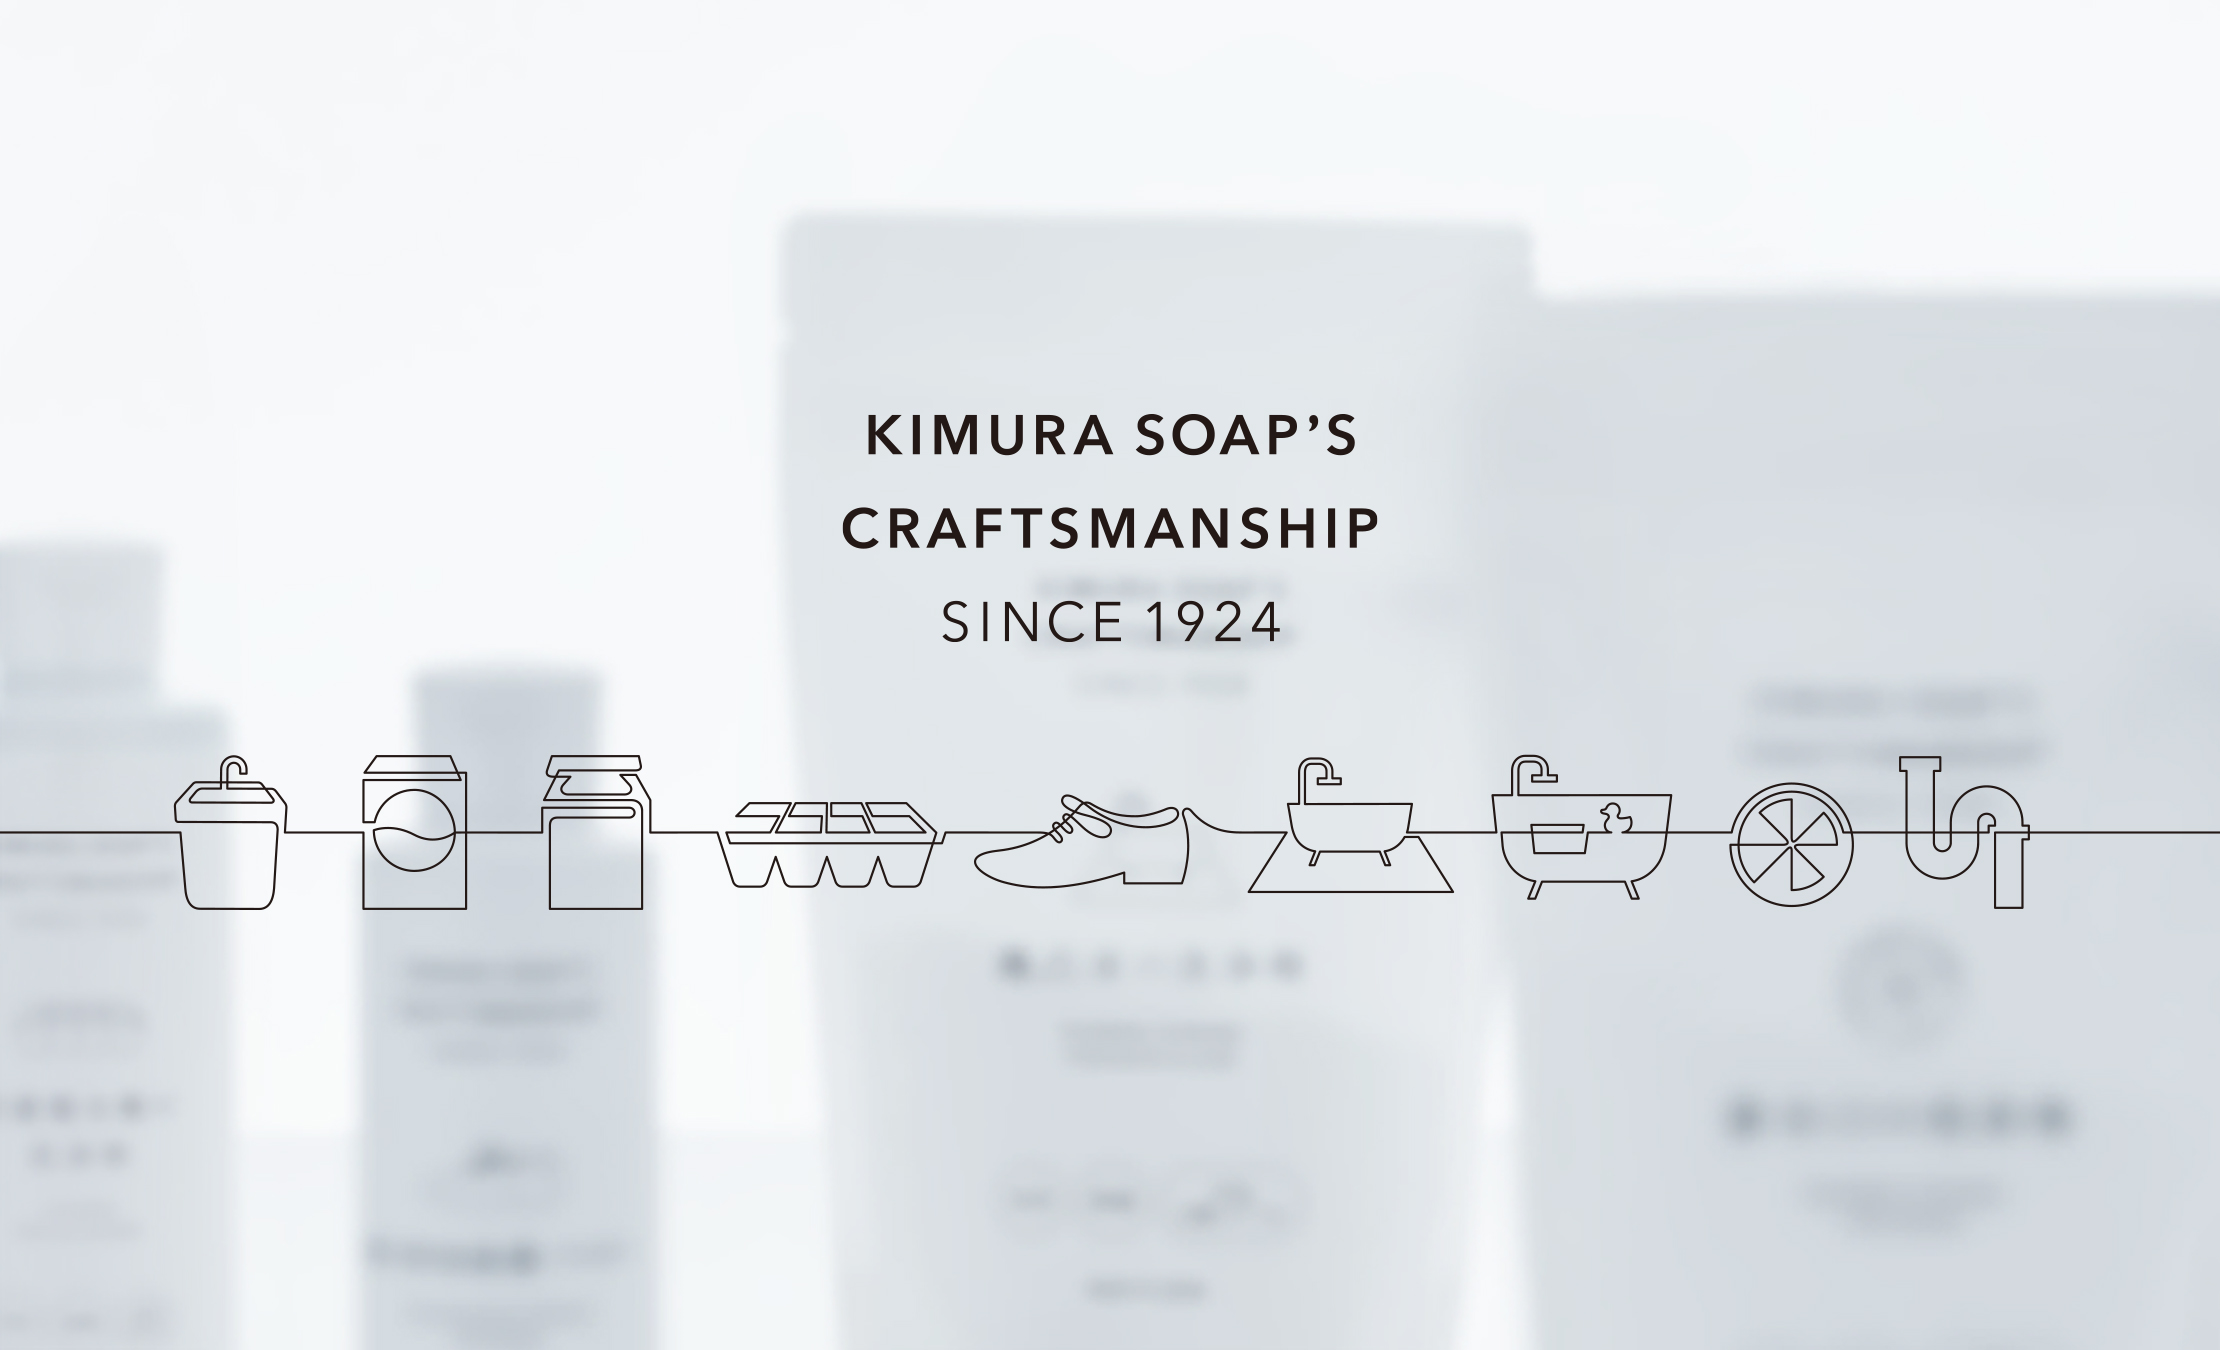 C SERIES KIMURA SOAP CRAFTMANSHIP SINCE 1924